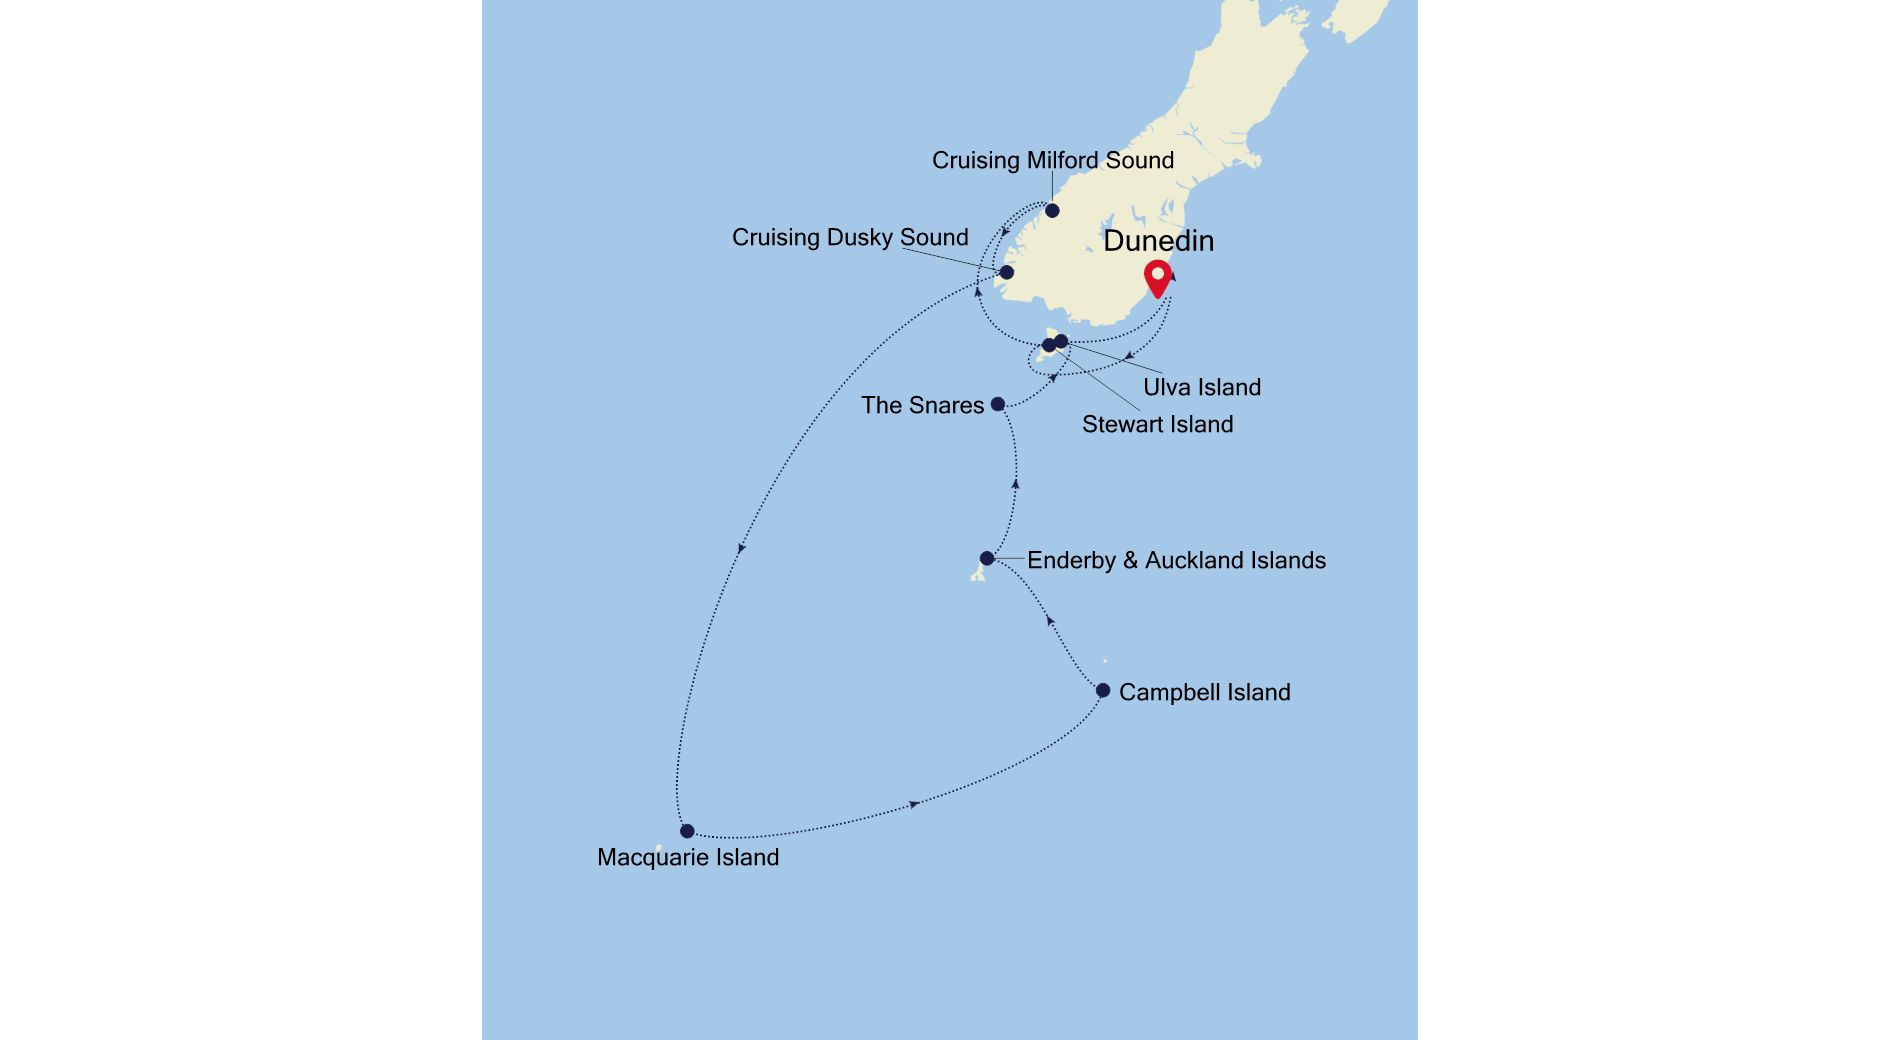 E1210104014 - Dunedin a Dunedin